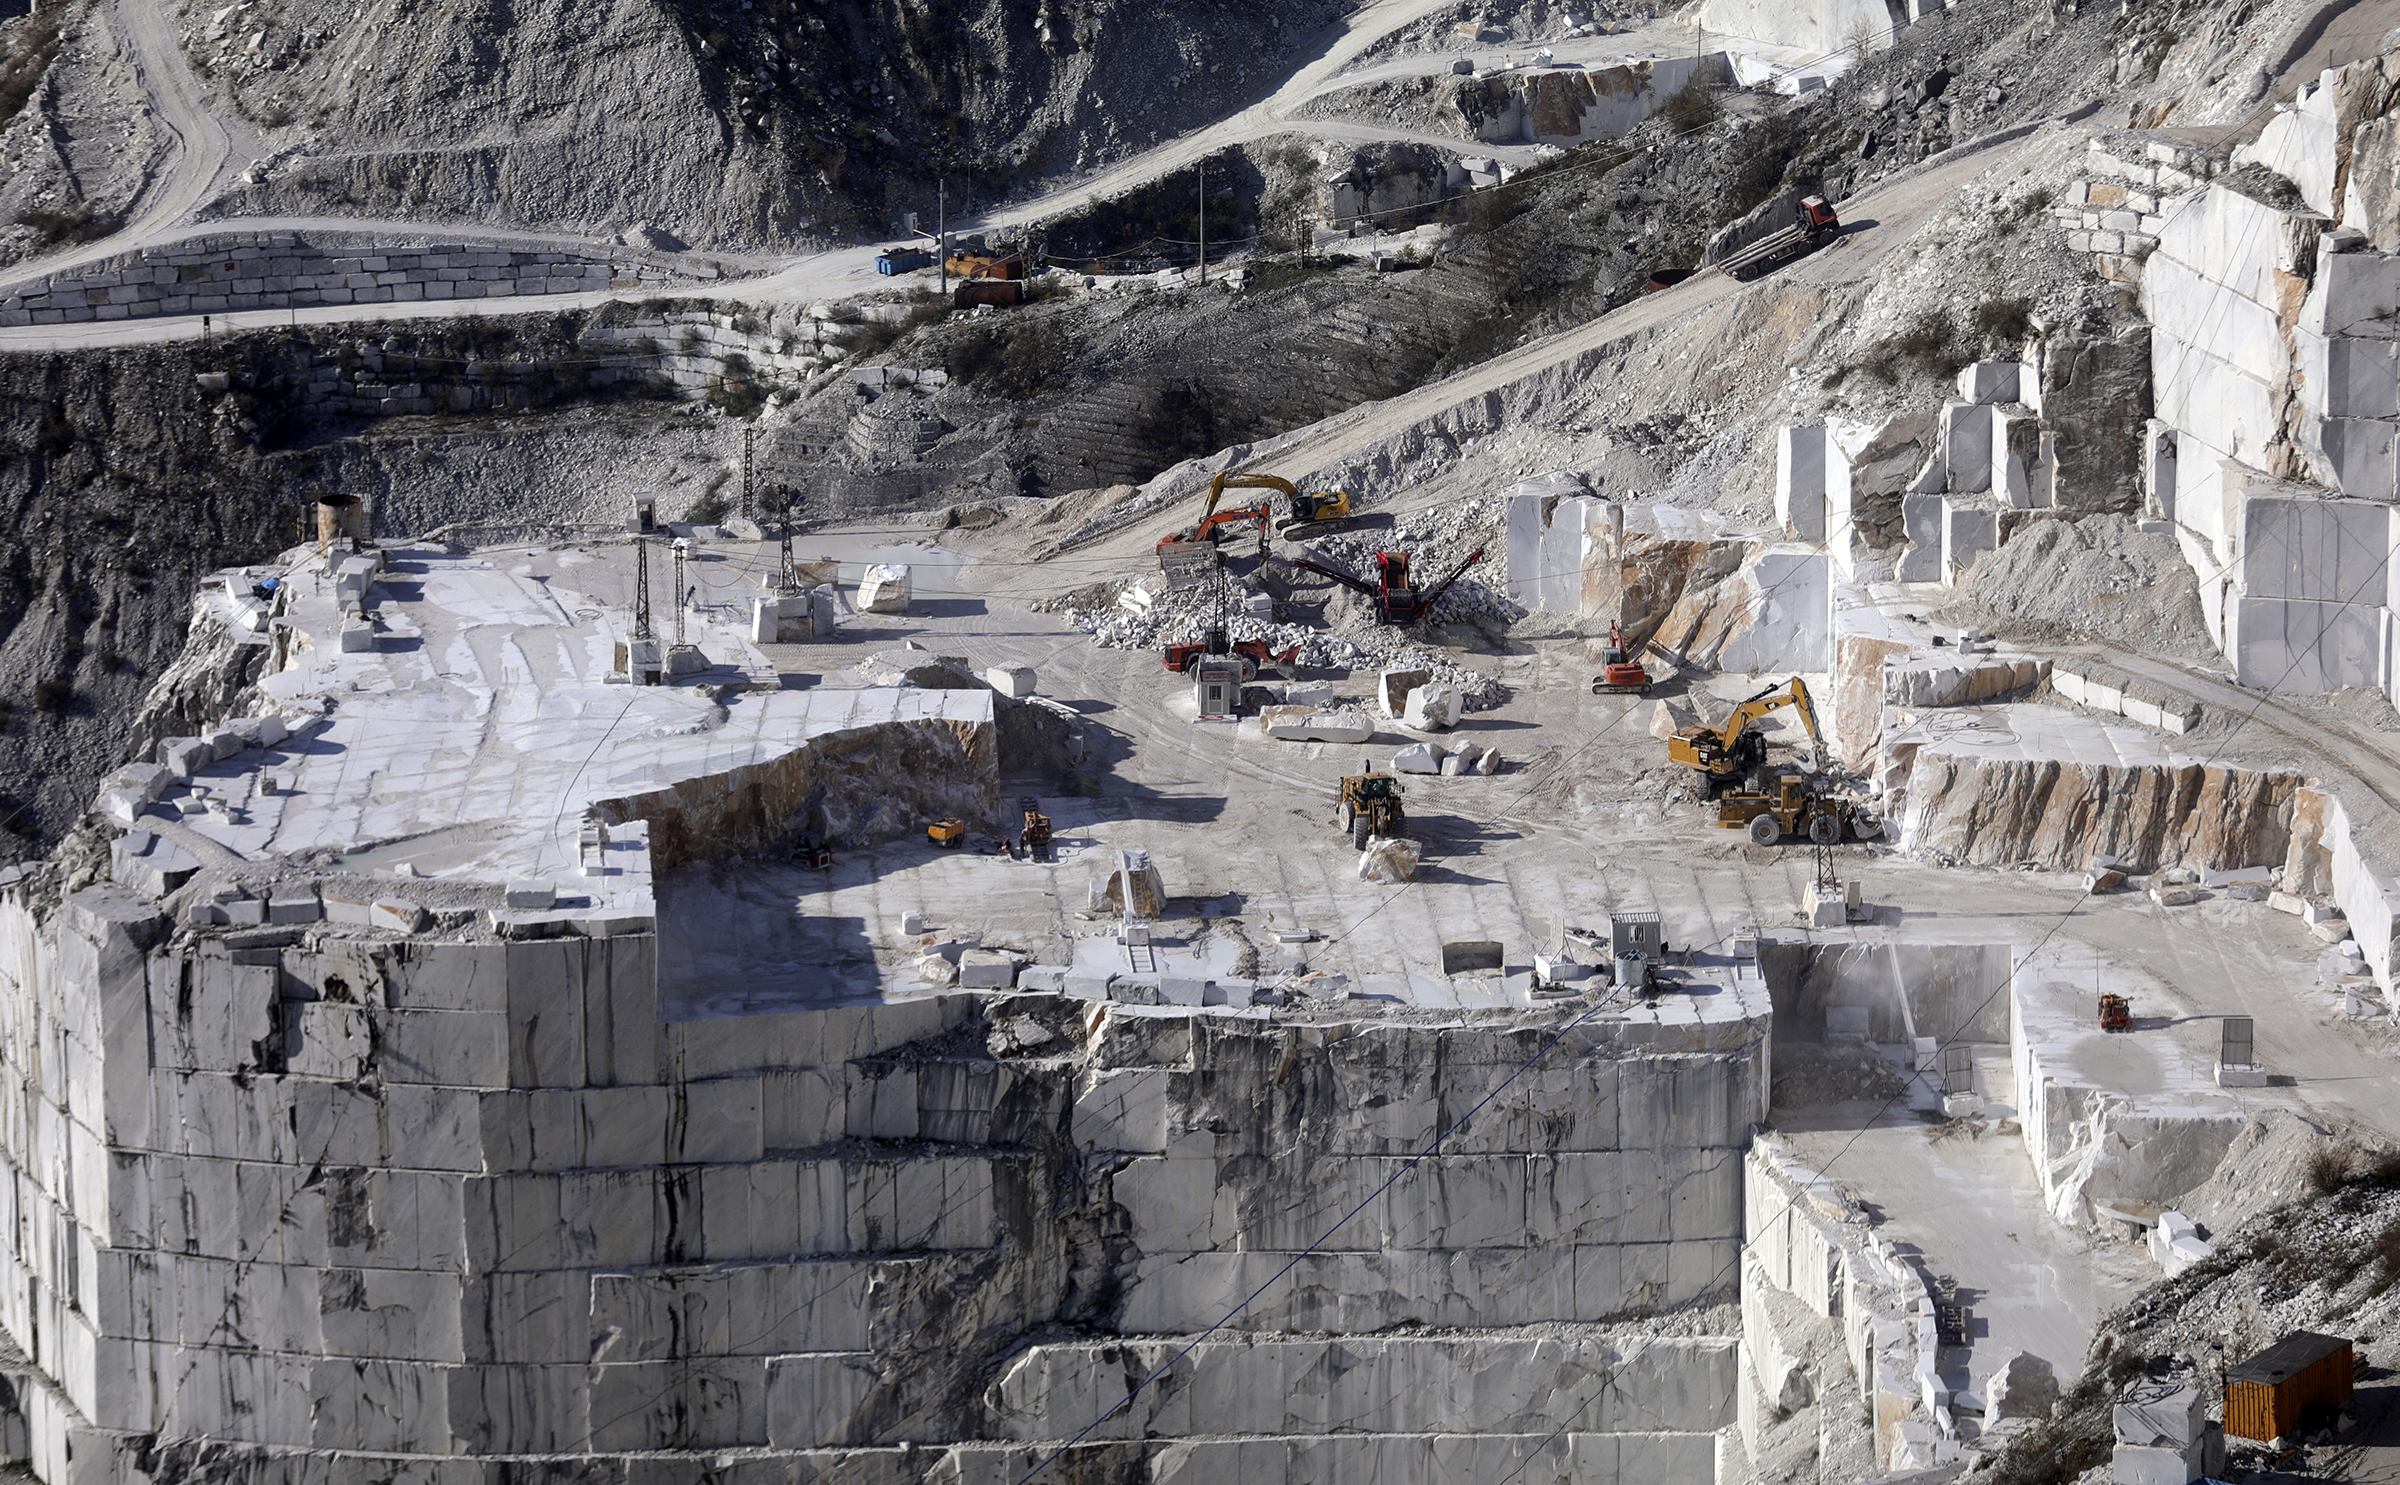 Marble quarry in Carrara, Italy, on Thursday, Nov. 15, 2018.